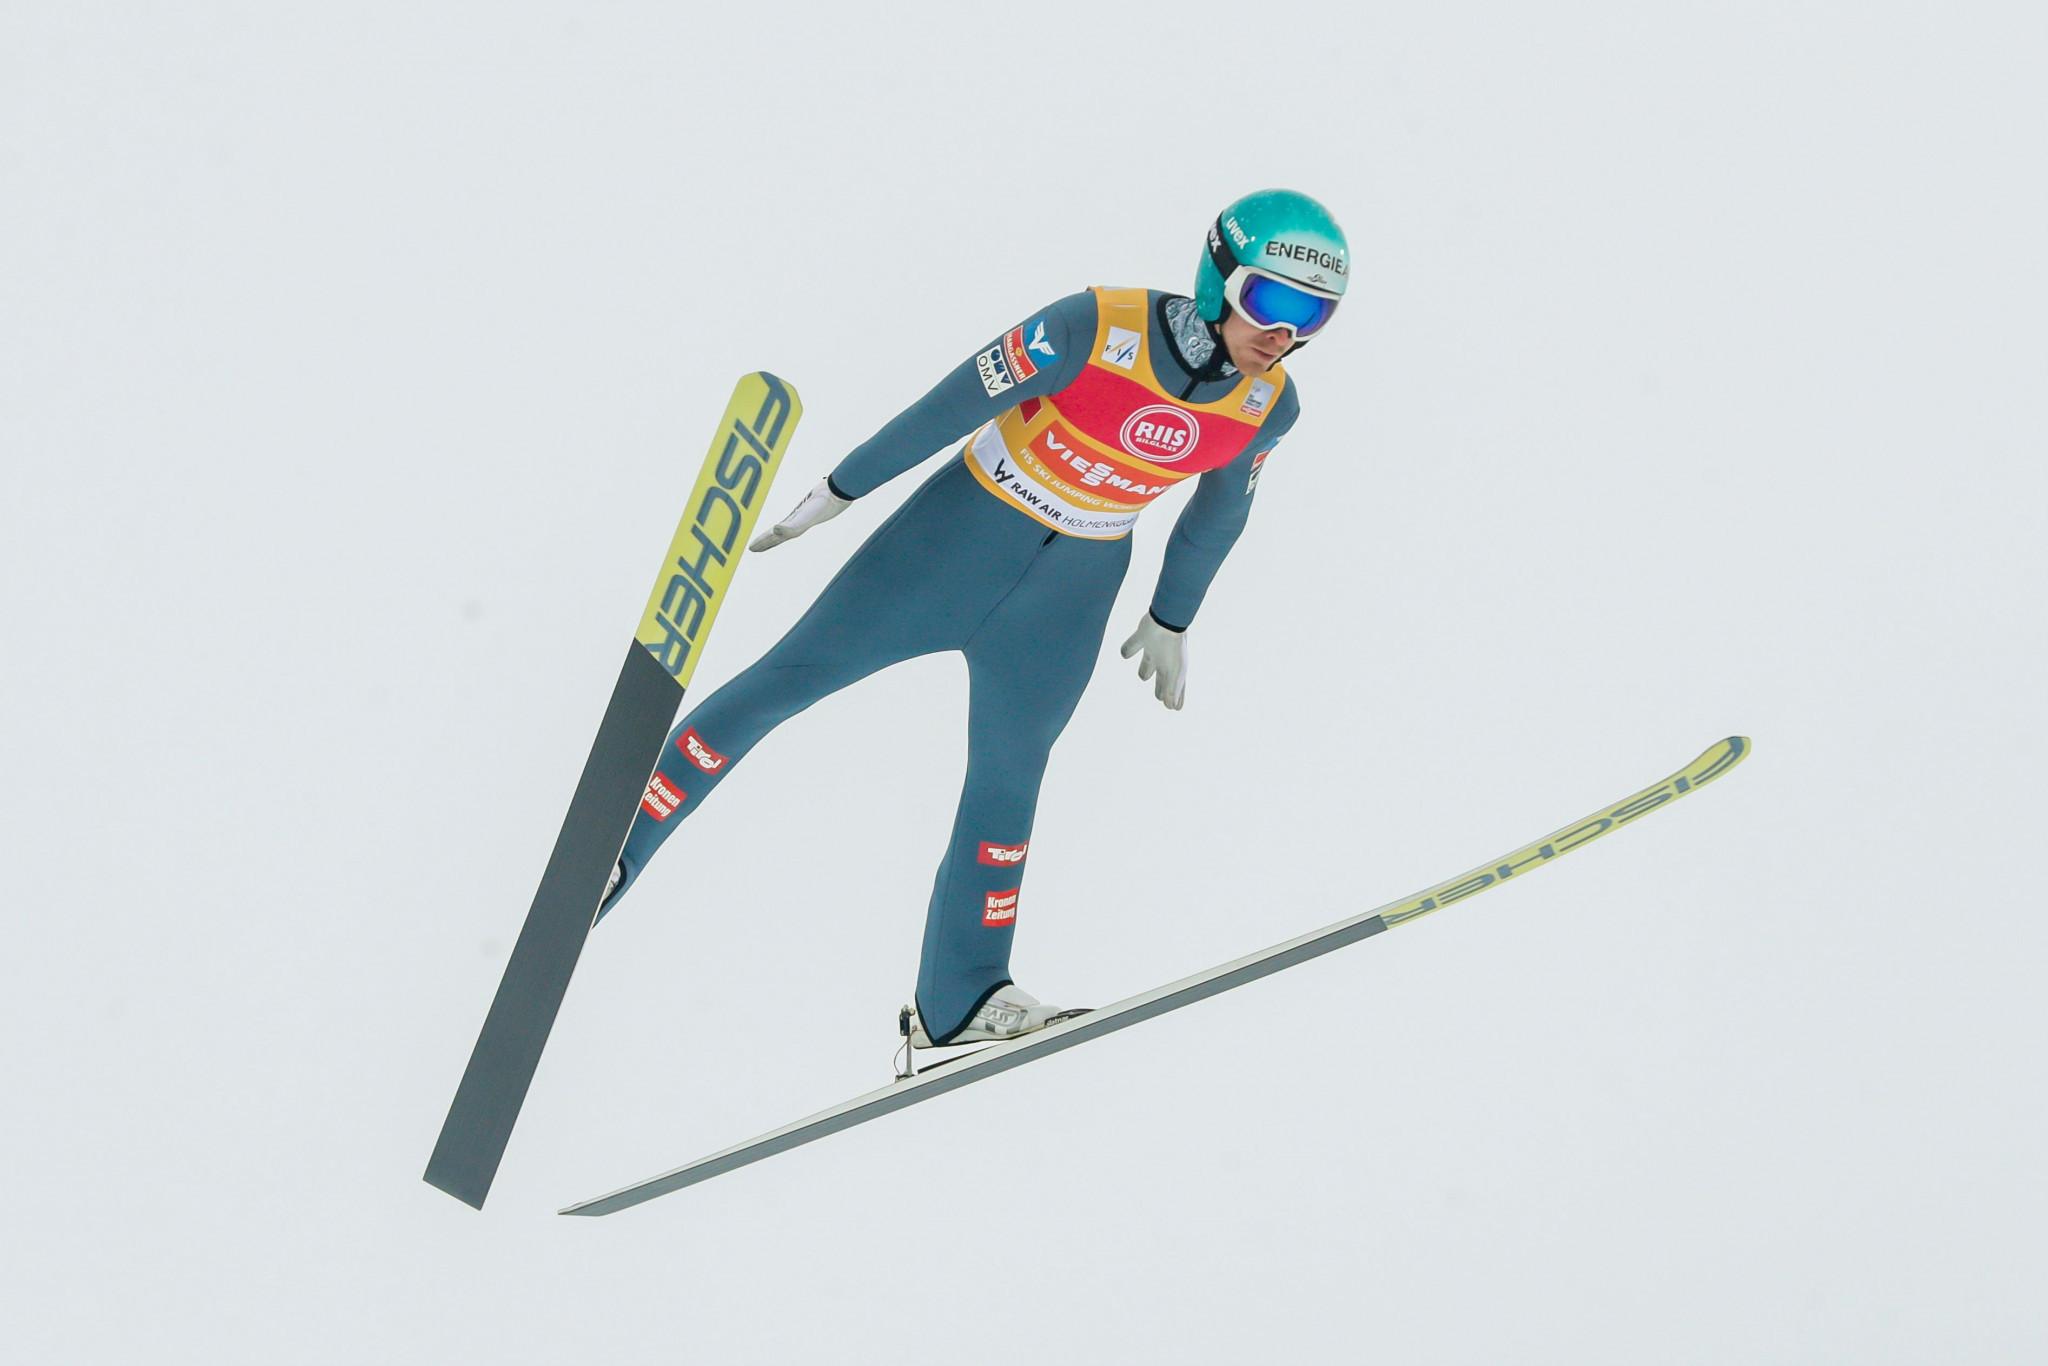 Austria win team event at FIS Ski Jumping World Cup in Wisla